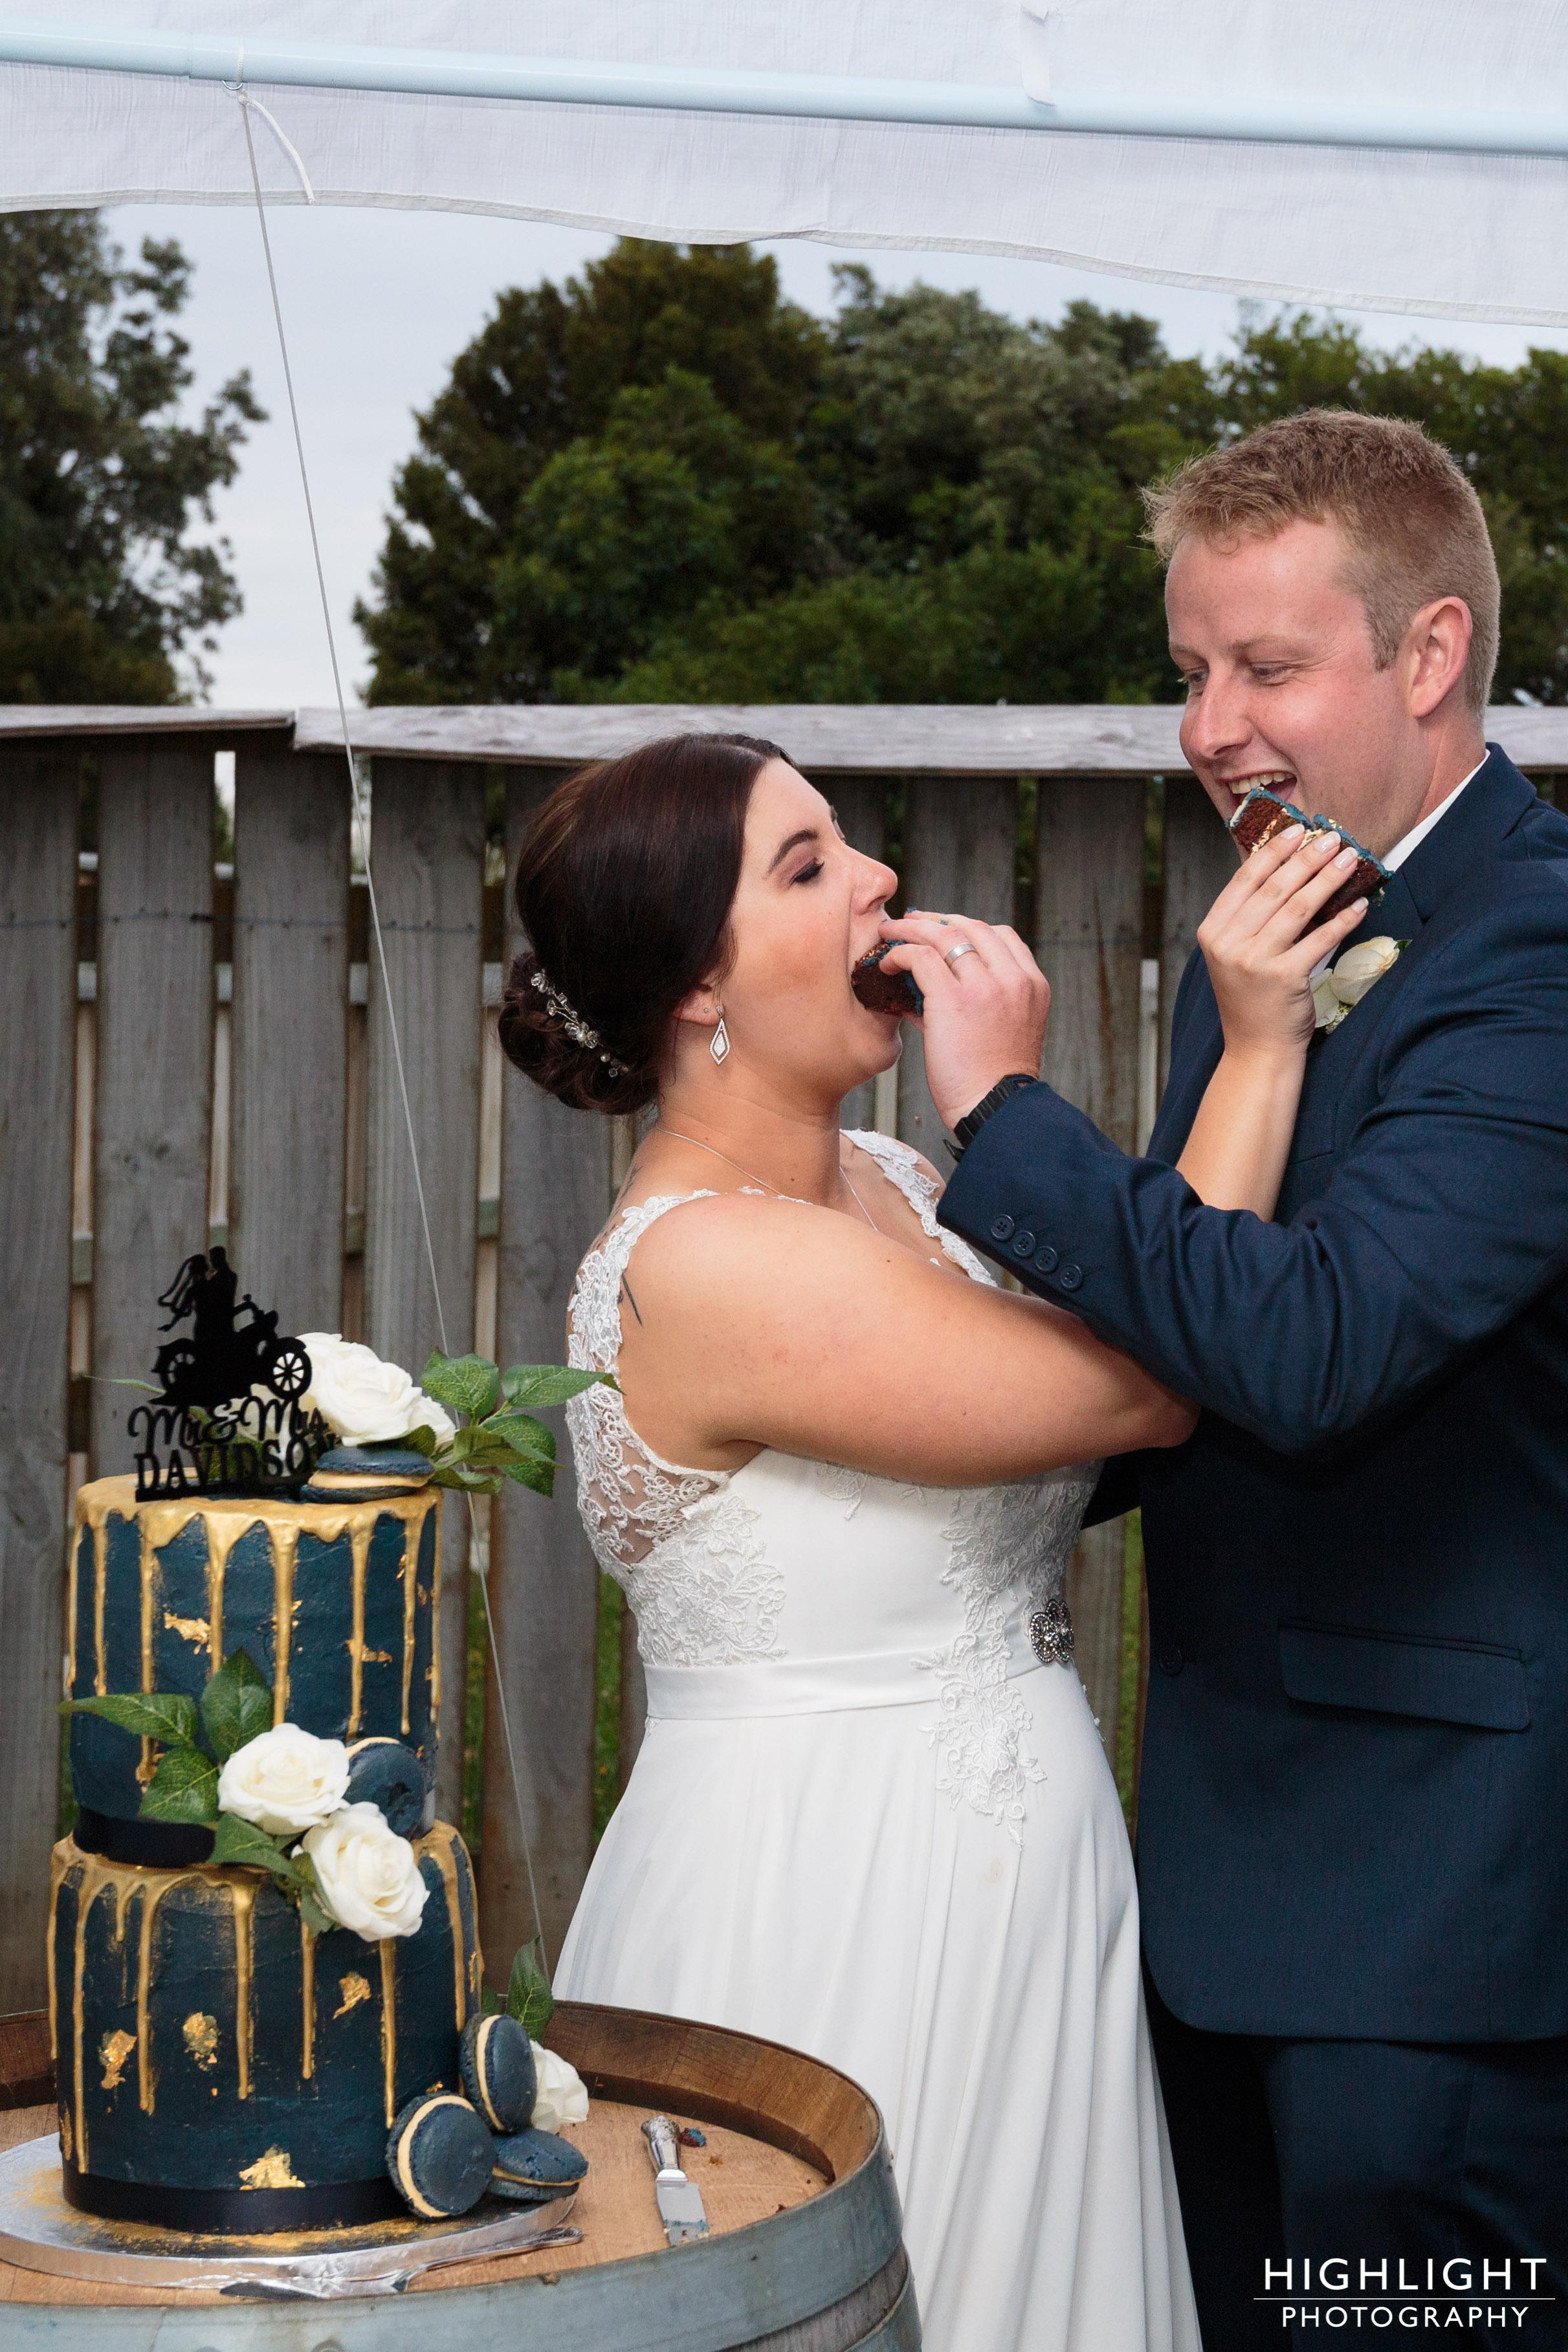 JM-2017-Highlight-wedding-photography-palmerston-north-new-zealand-210.jpg